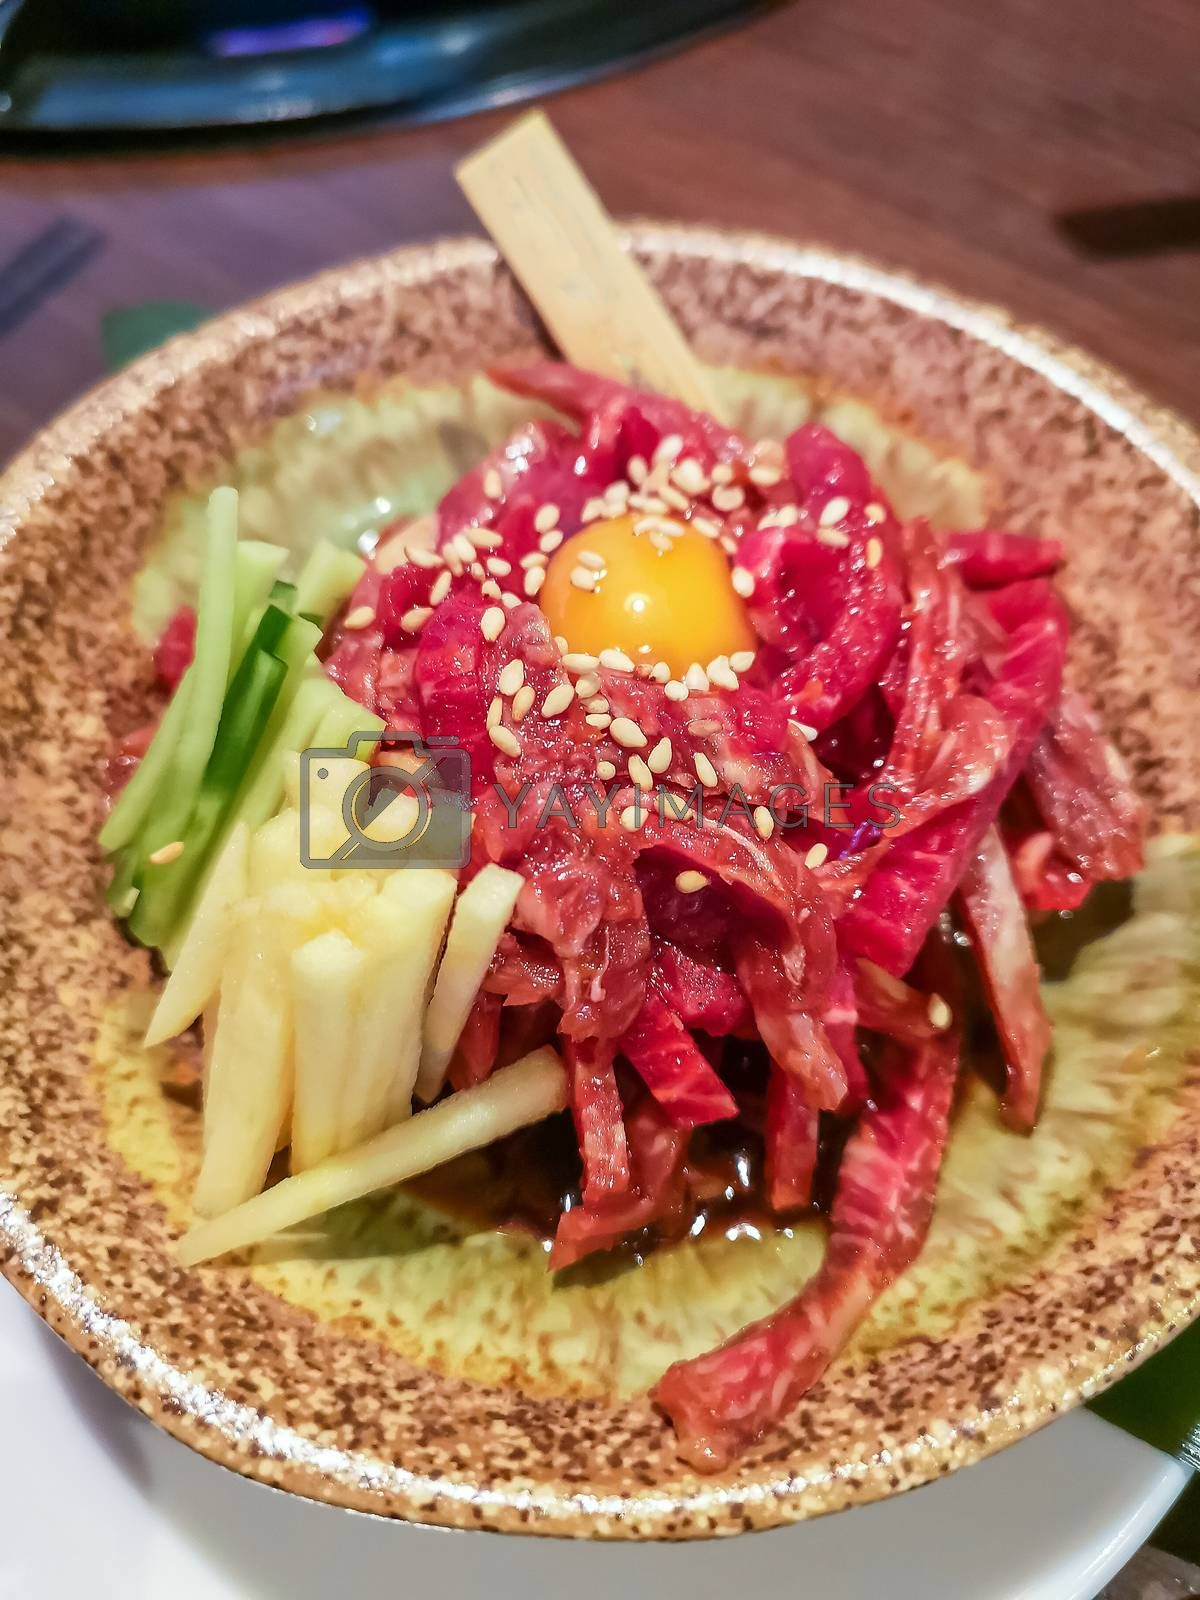 Okinawa style local beef dish in Naha, Japan